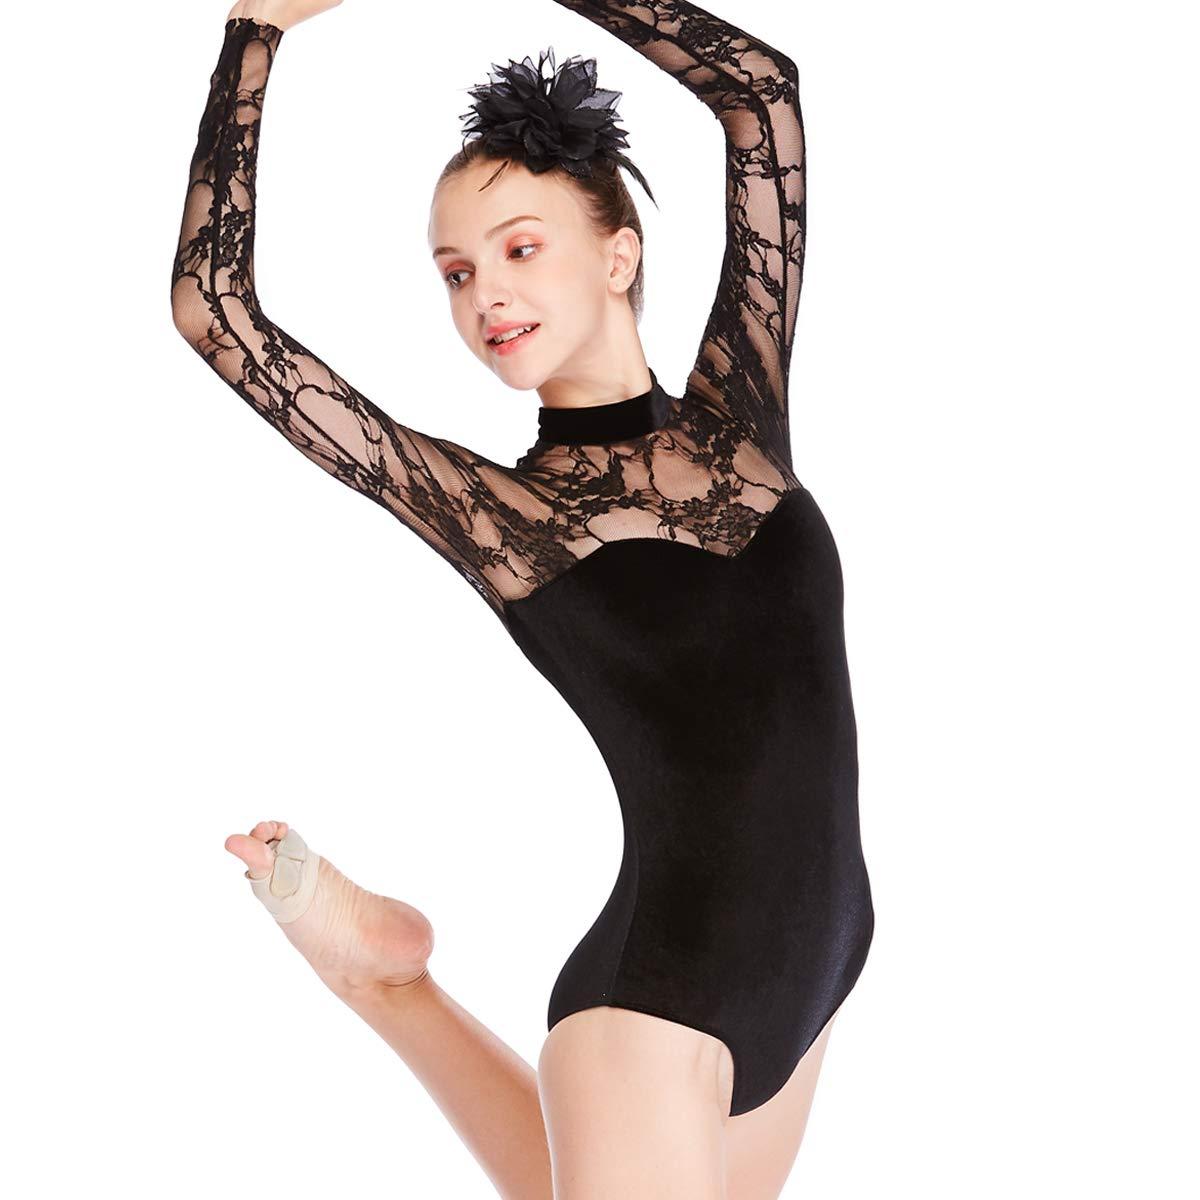 3fb451c606 Amazon.com: MiDee Dance Costume: Acro & Gymnastics